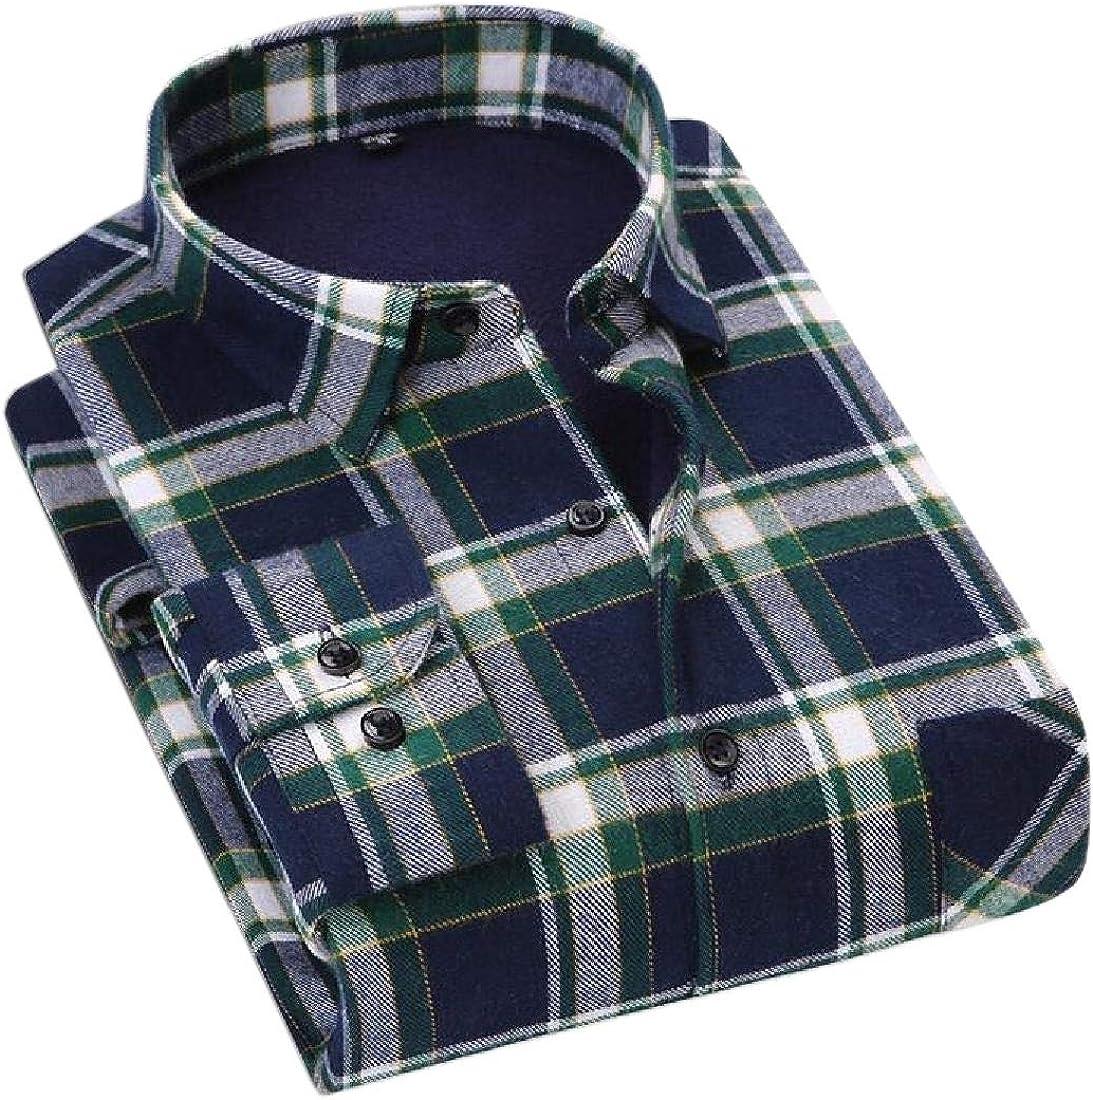 WSPLYSPJY Mens Thicken Cotton Brushed Warm Long Sleeve Plaid Fleece Casual Shirt